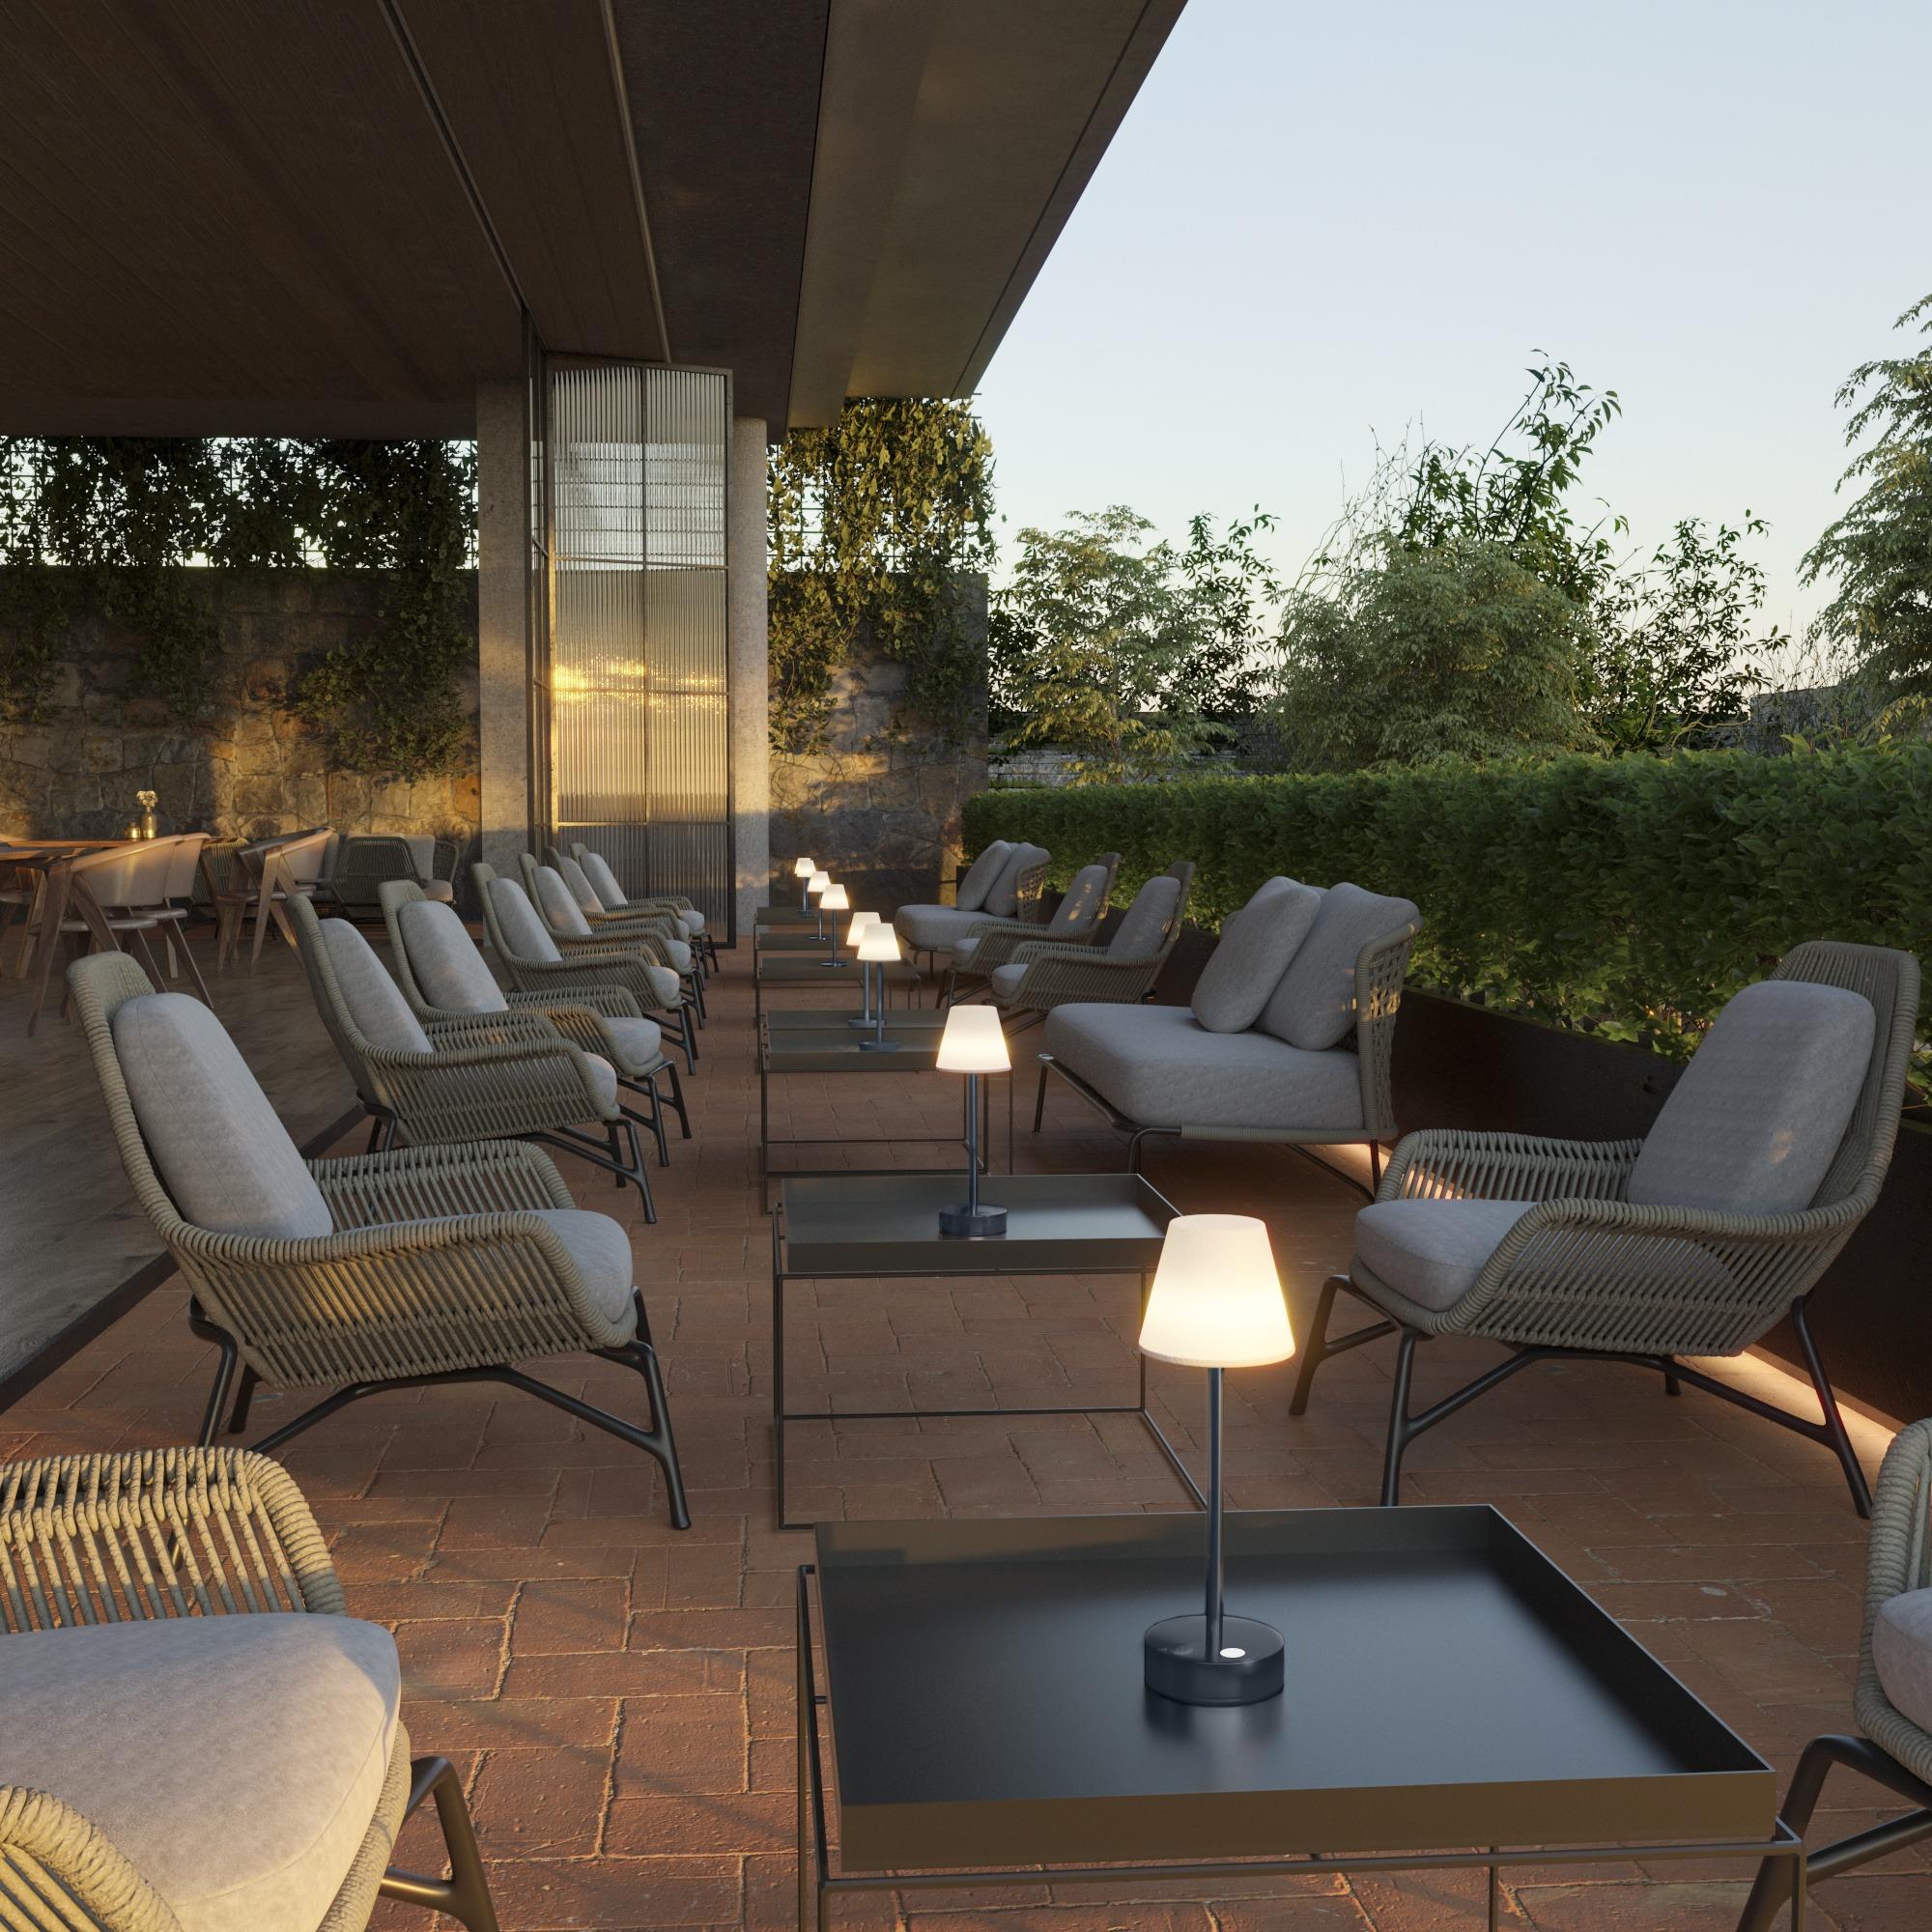 new_garden_lola_slim_30_light_outdoor_battery_2021_corefurniture